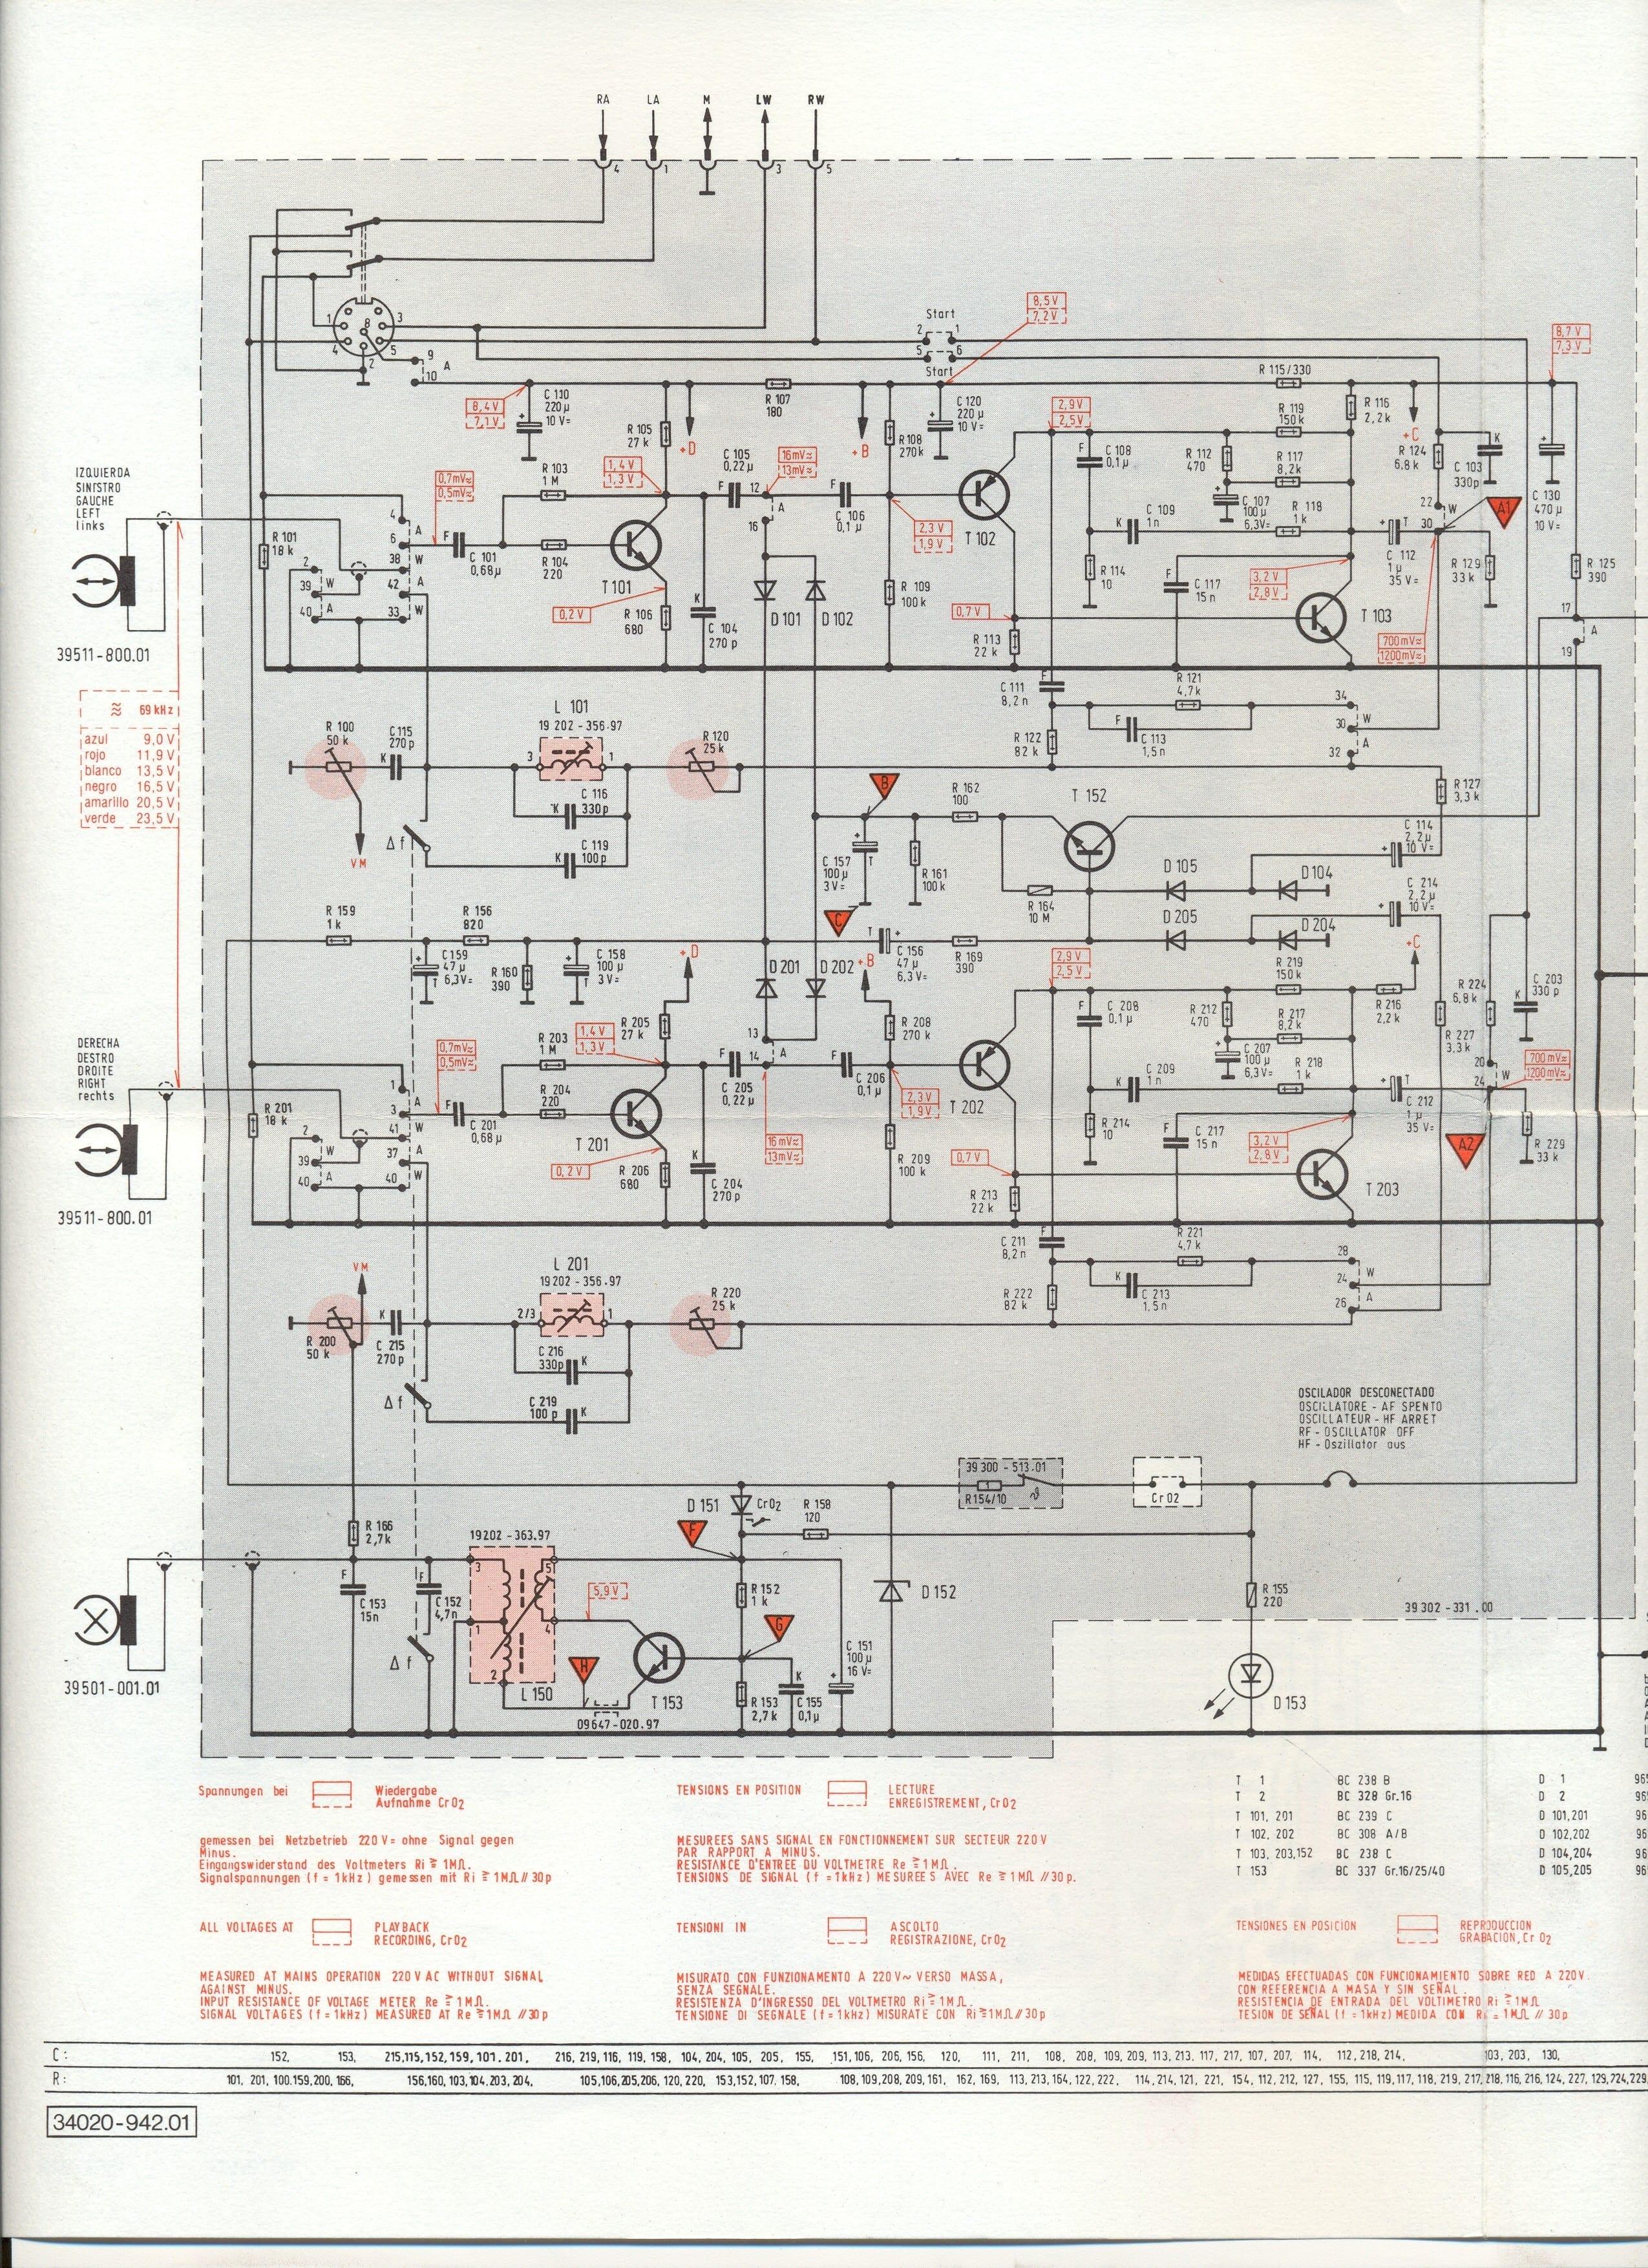 Grundig Studio 3010 - Cassette 01